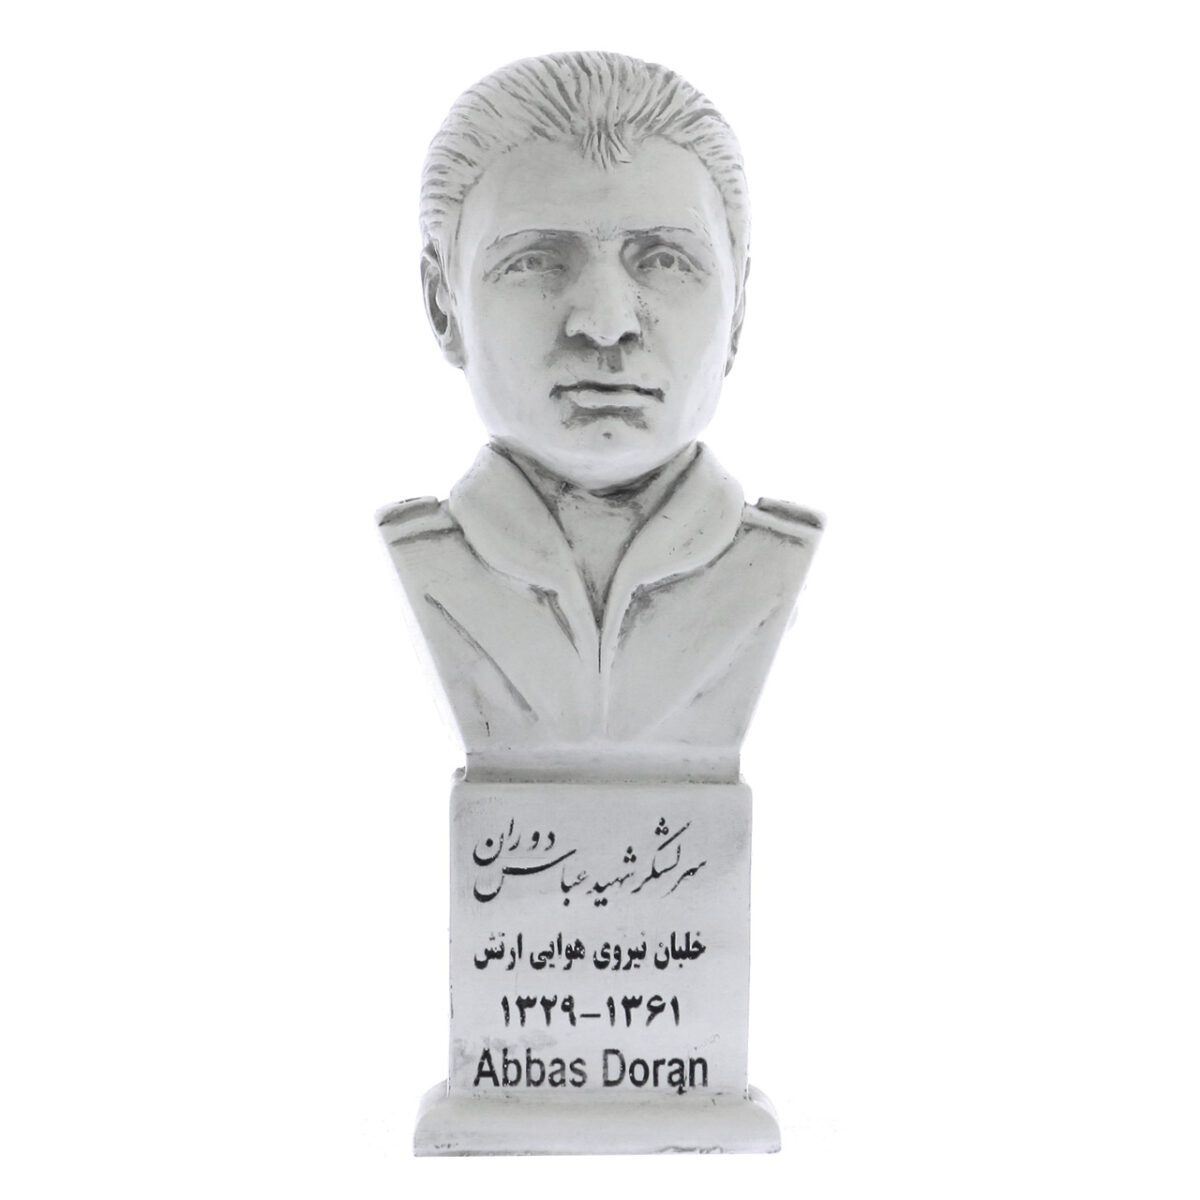 abbas doran s 1200x1200 - سردیس شهید سرلشکر خلبان عباس دوران